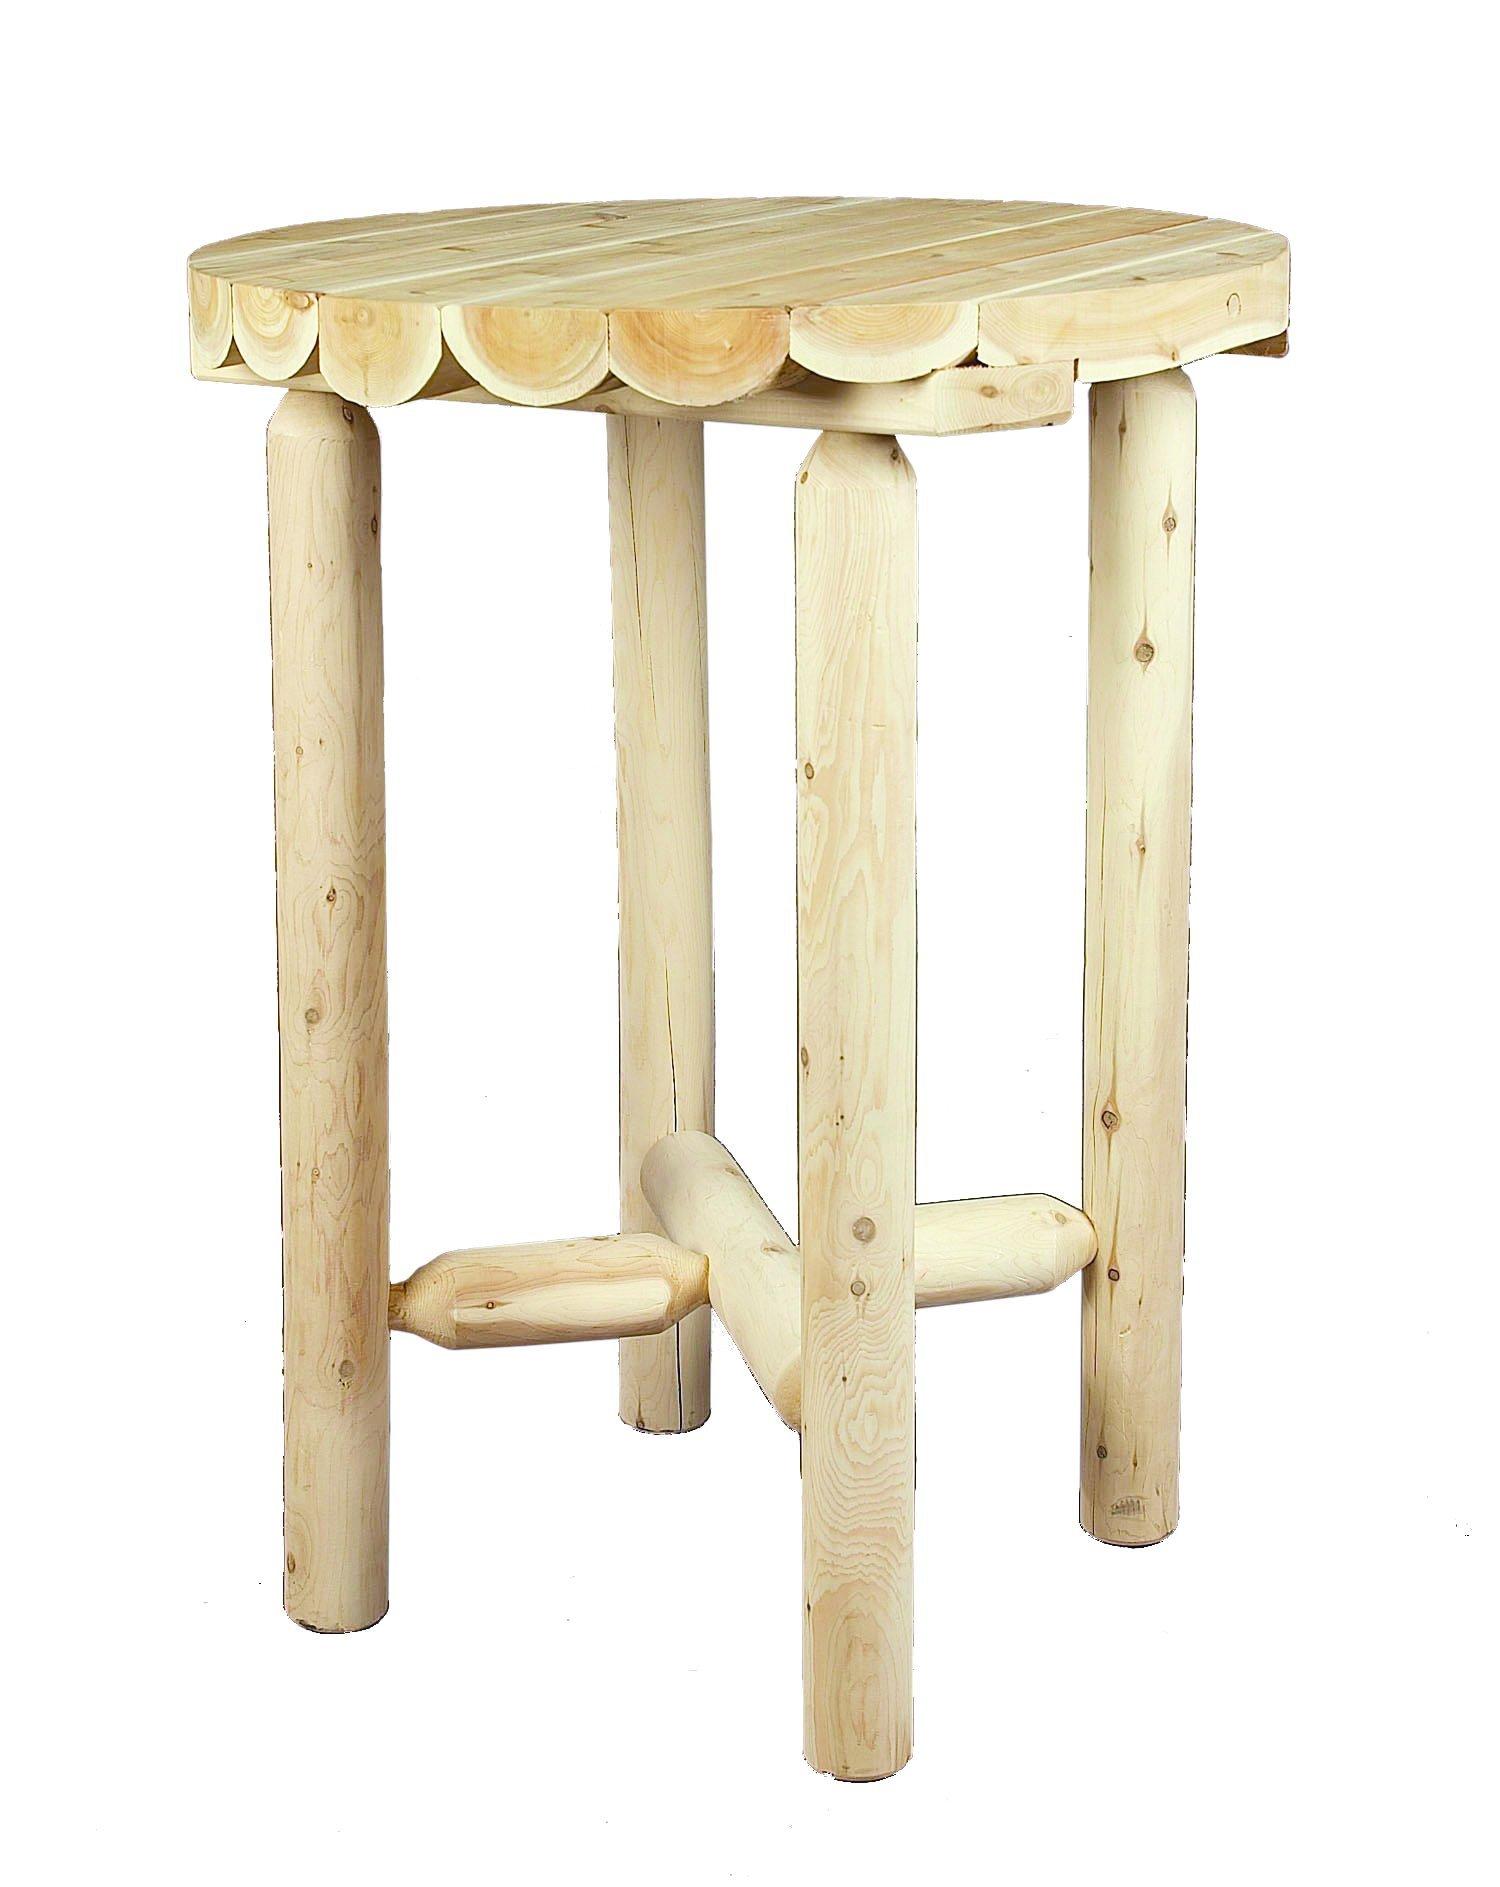 Cedarlooks 110009B Log Pub Table, 32-Inch